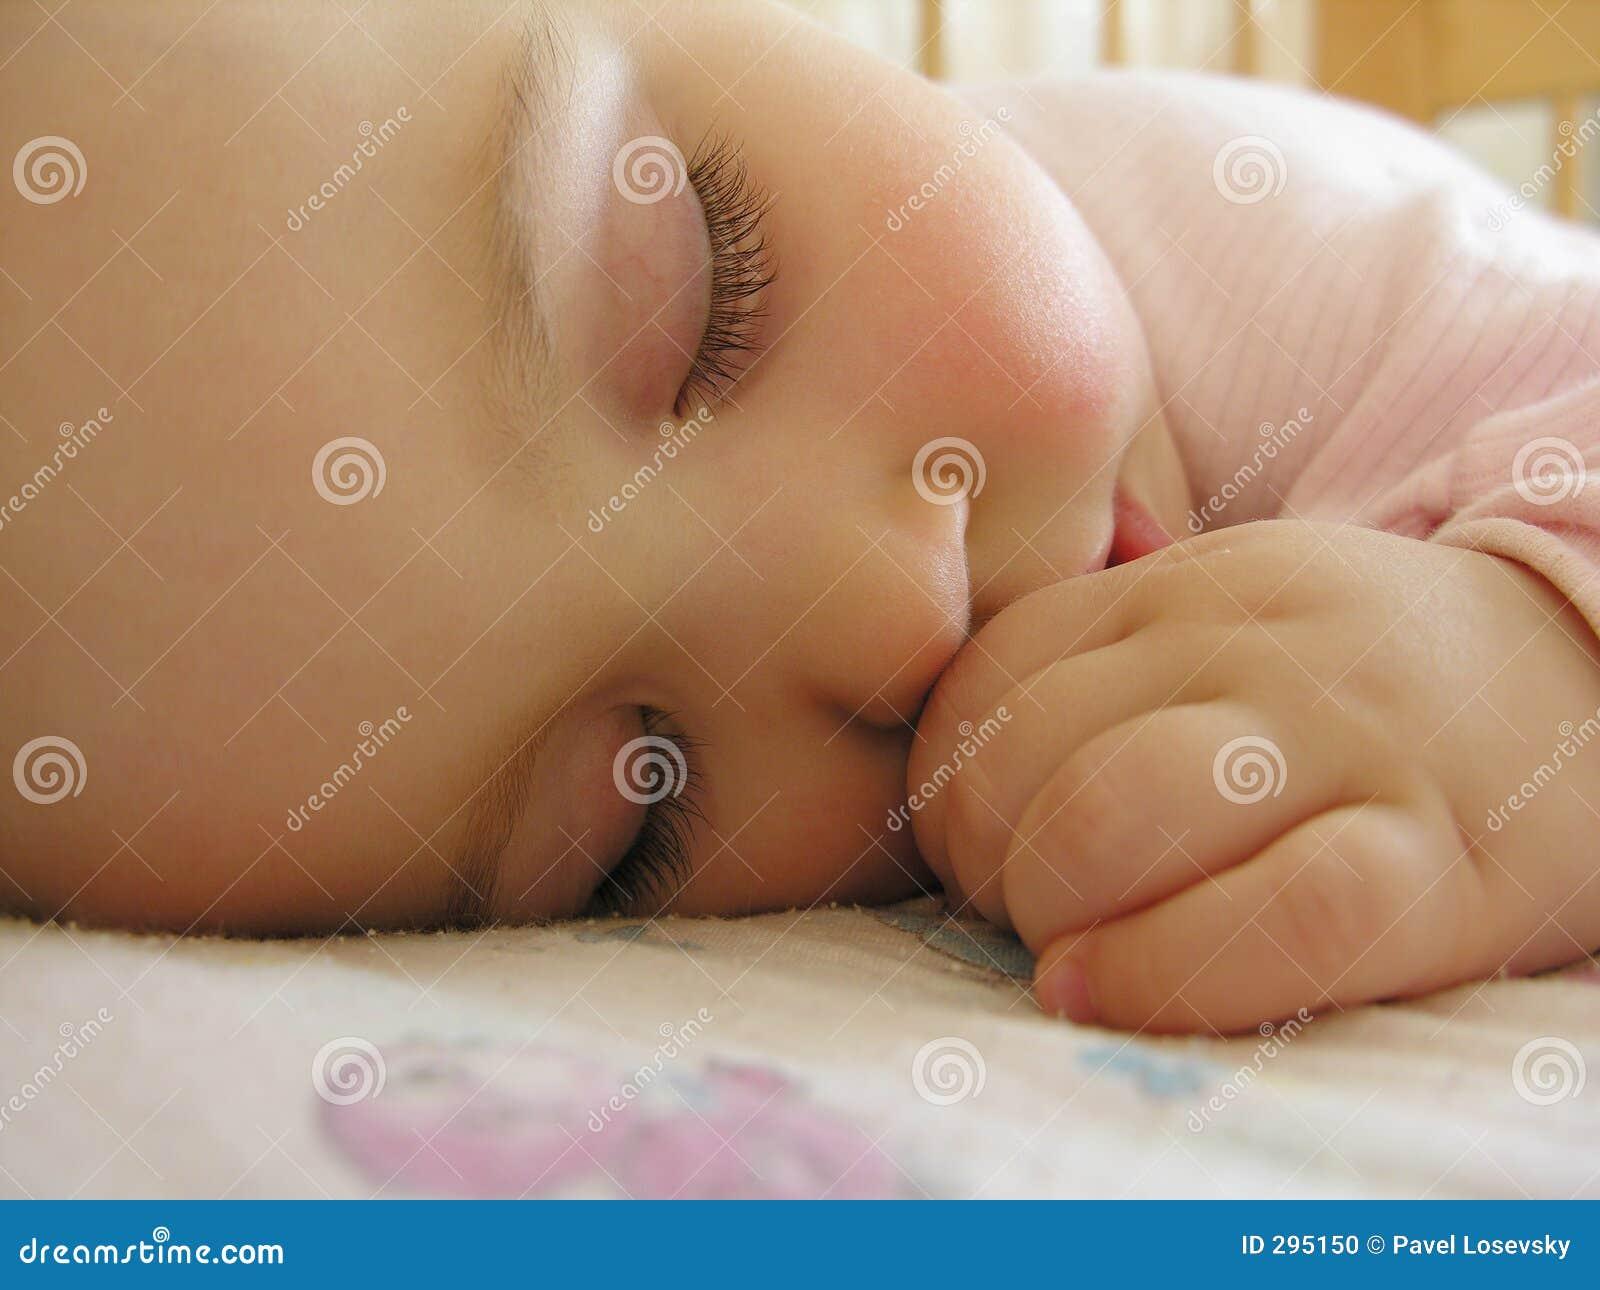 Sleeping baby with hand